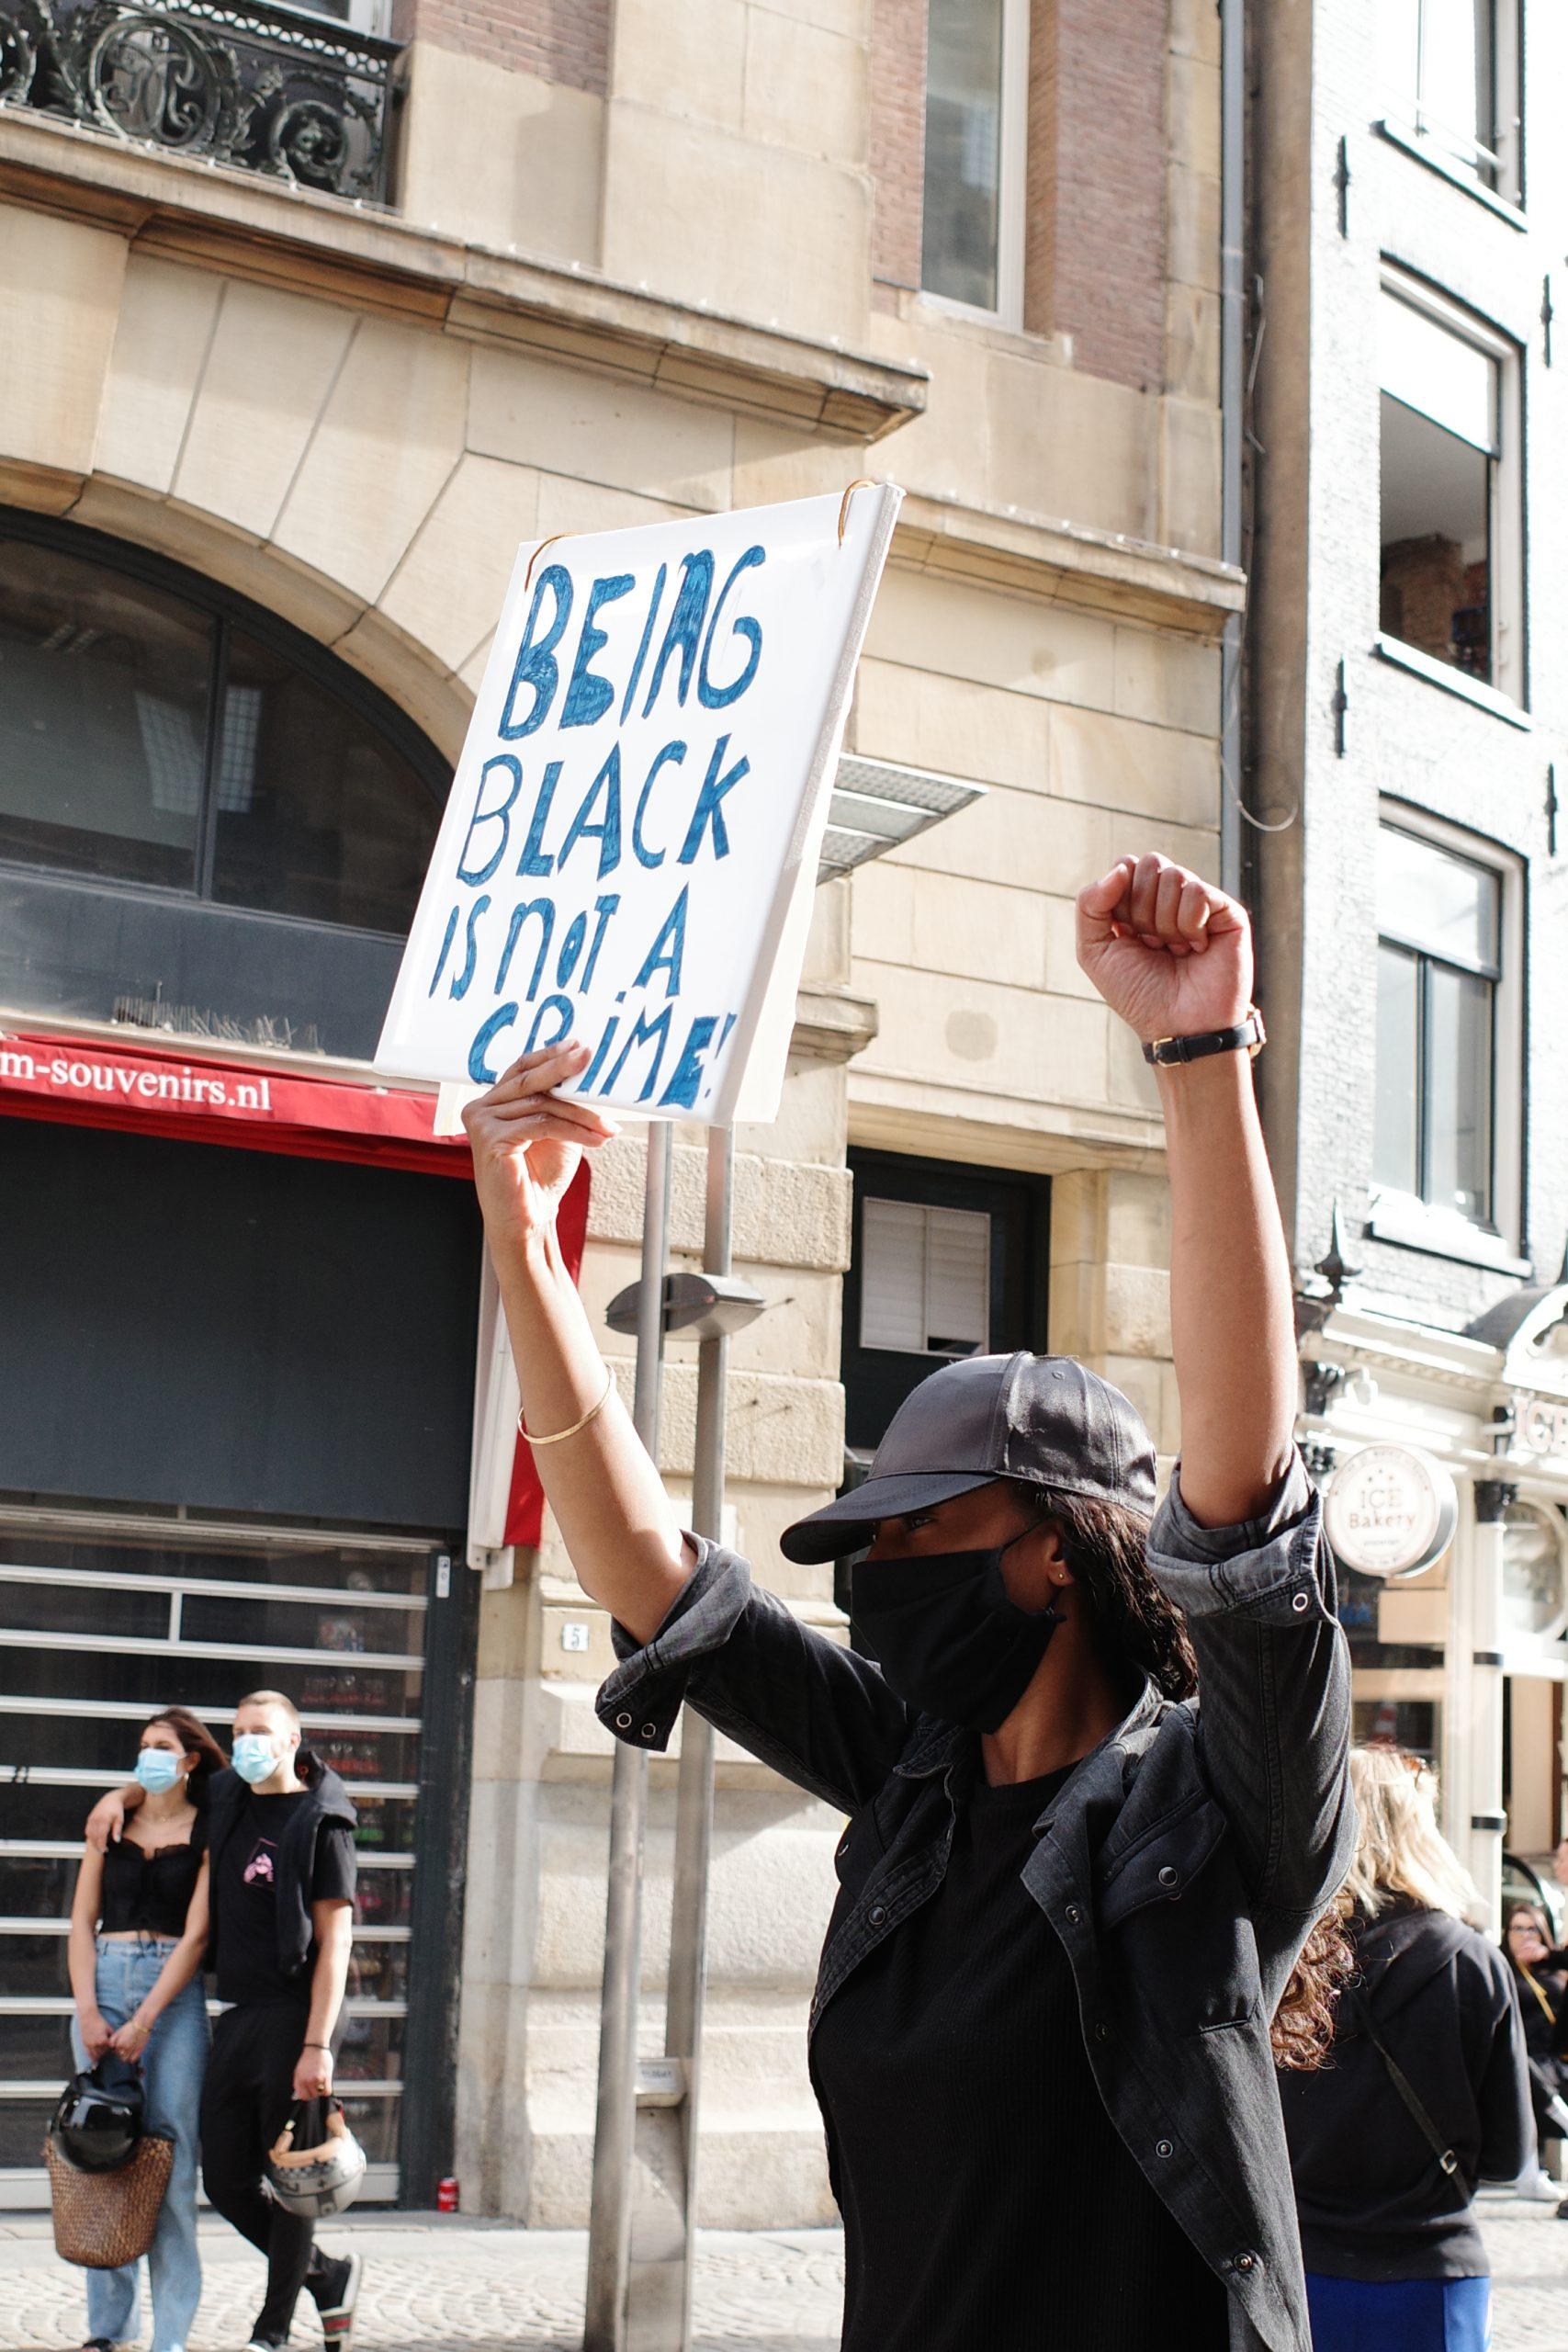 Hard//talk: 'Black Lives Matter' betekent óók in Nederland politiegeweld tegengaan 1